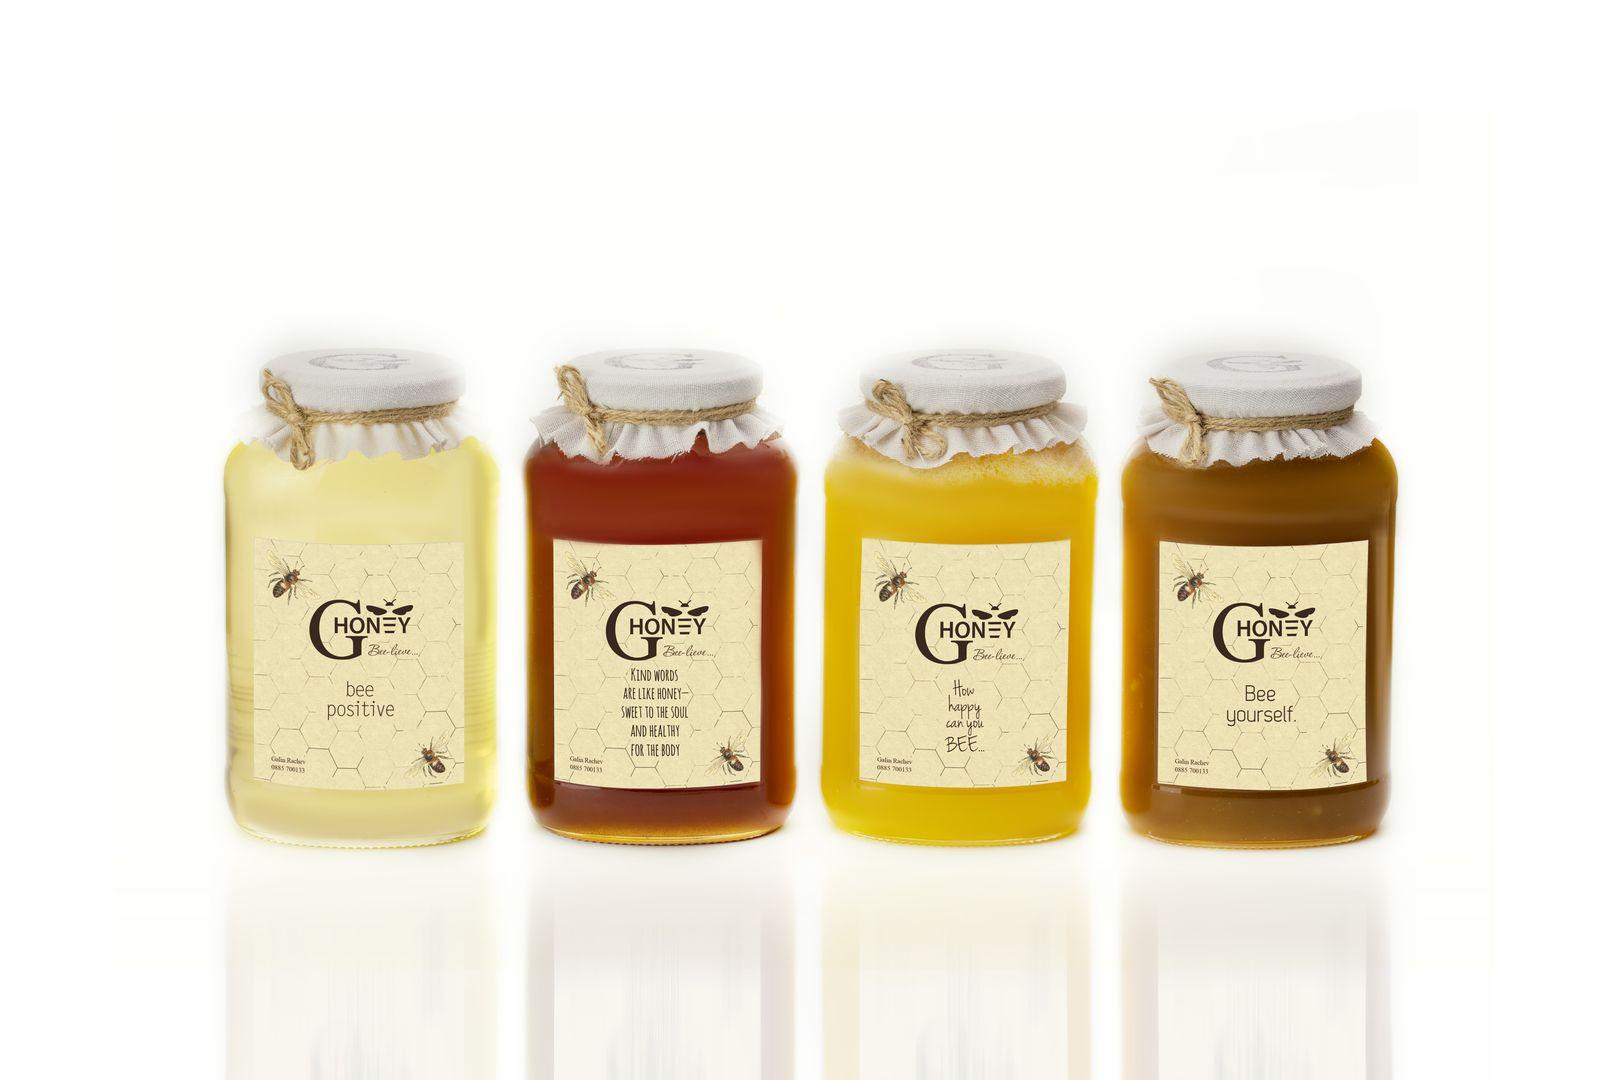 Пчелни суперхрани и натурална козметика - GHoney